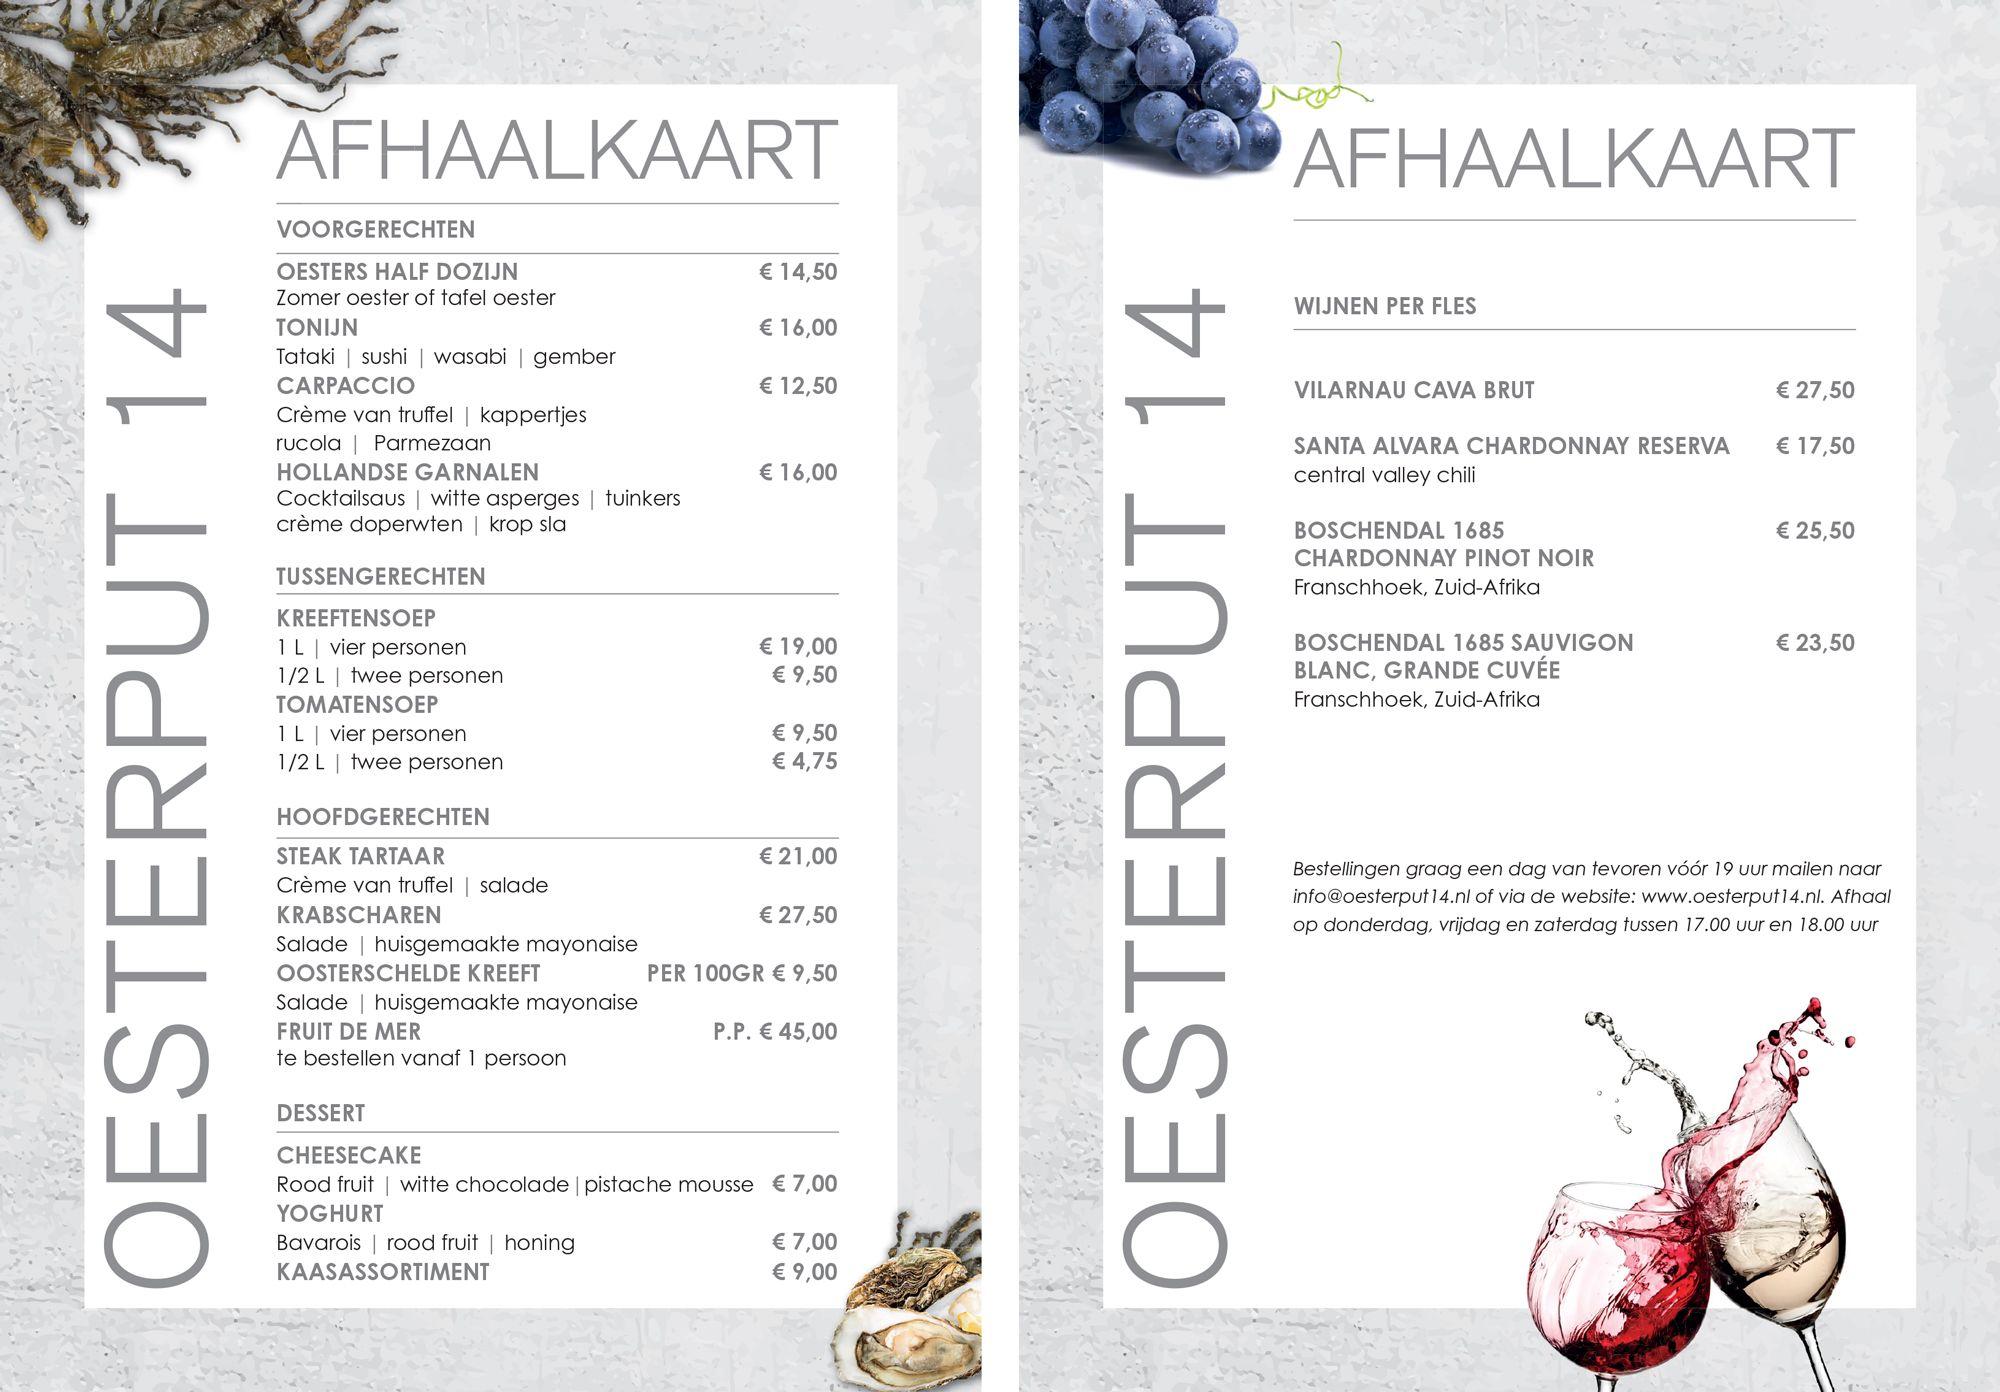 Afhaalkaart_Oesterput